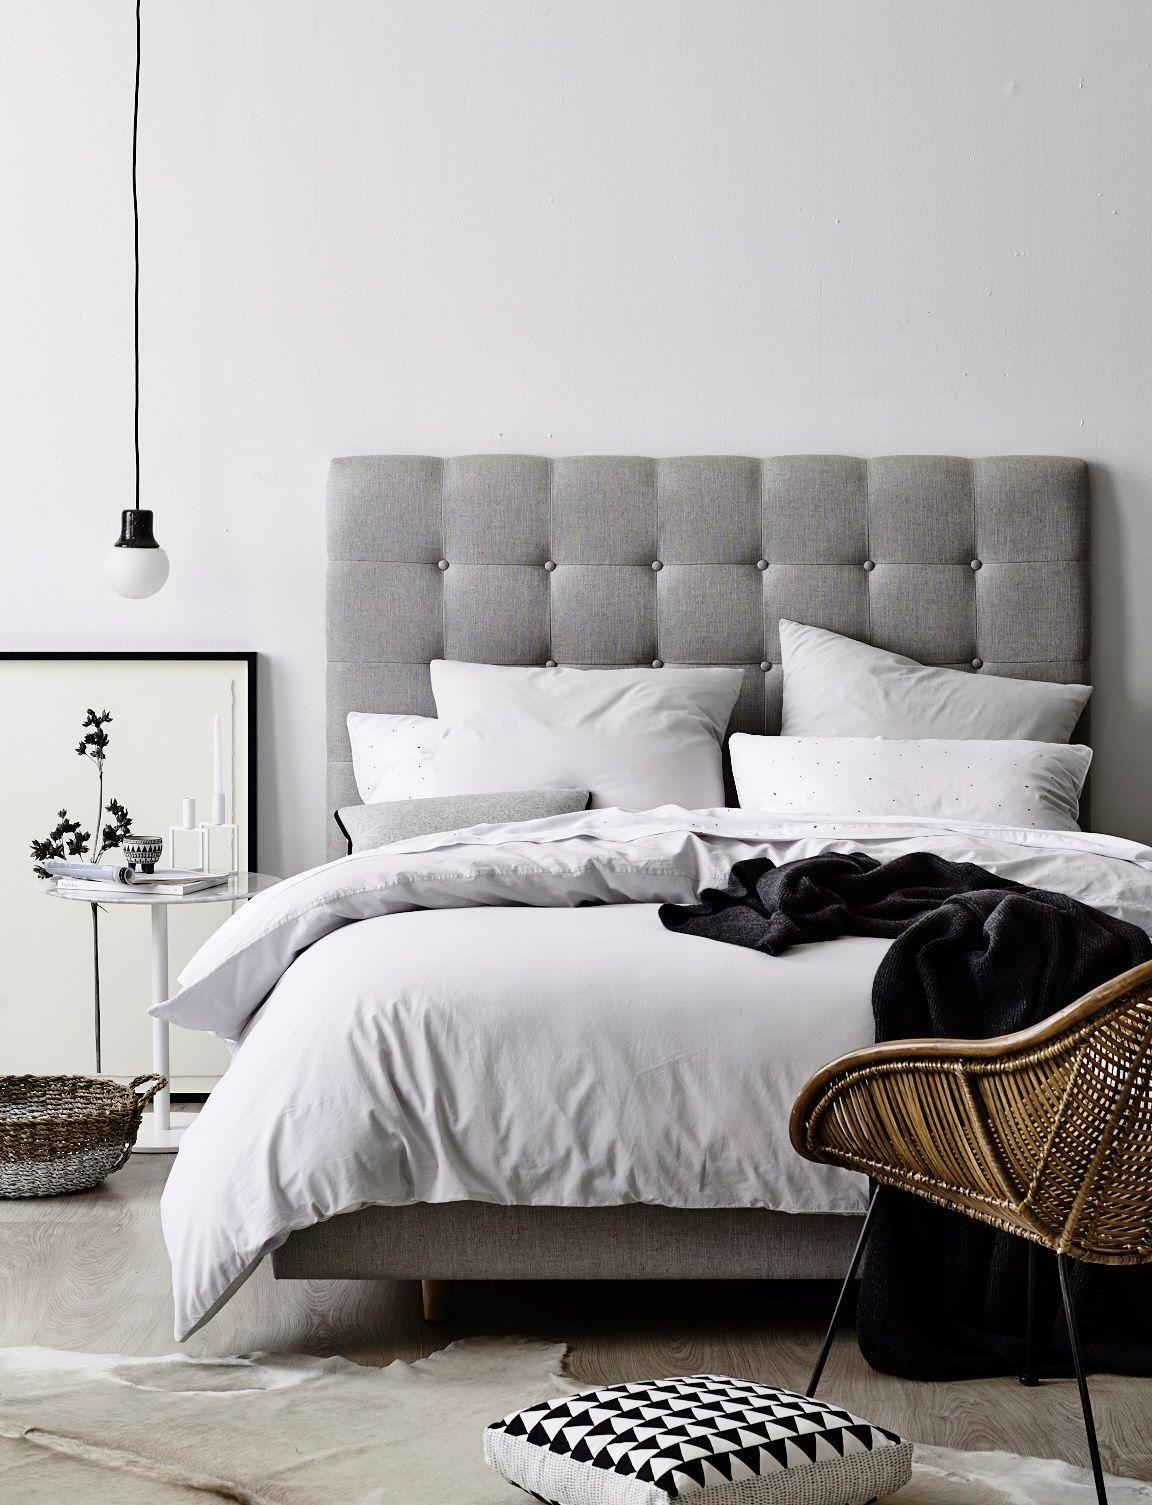 Custom Headboard Richmond Bedhead Heatherly Design Bedroom